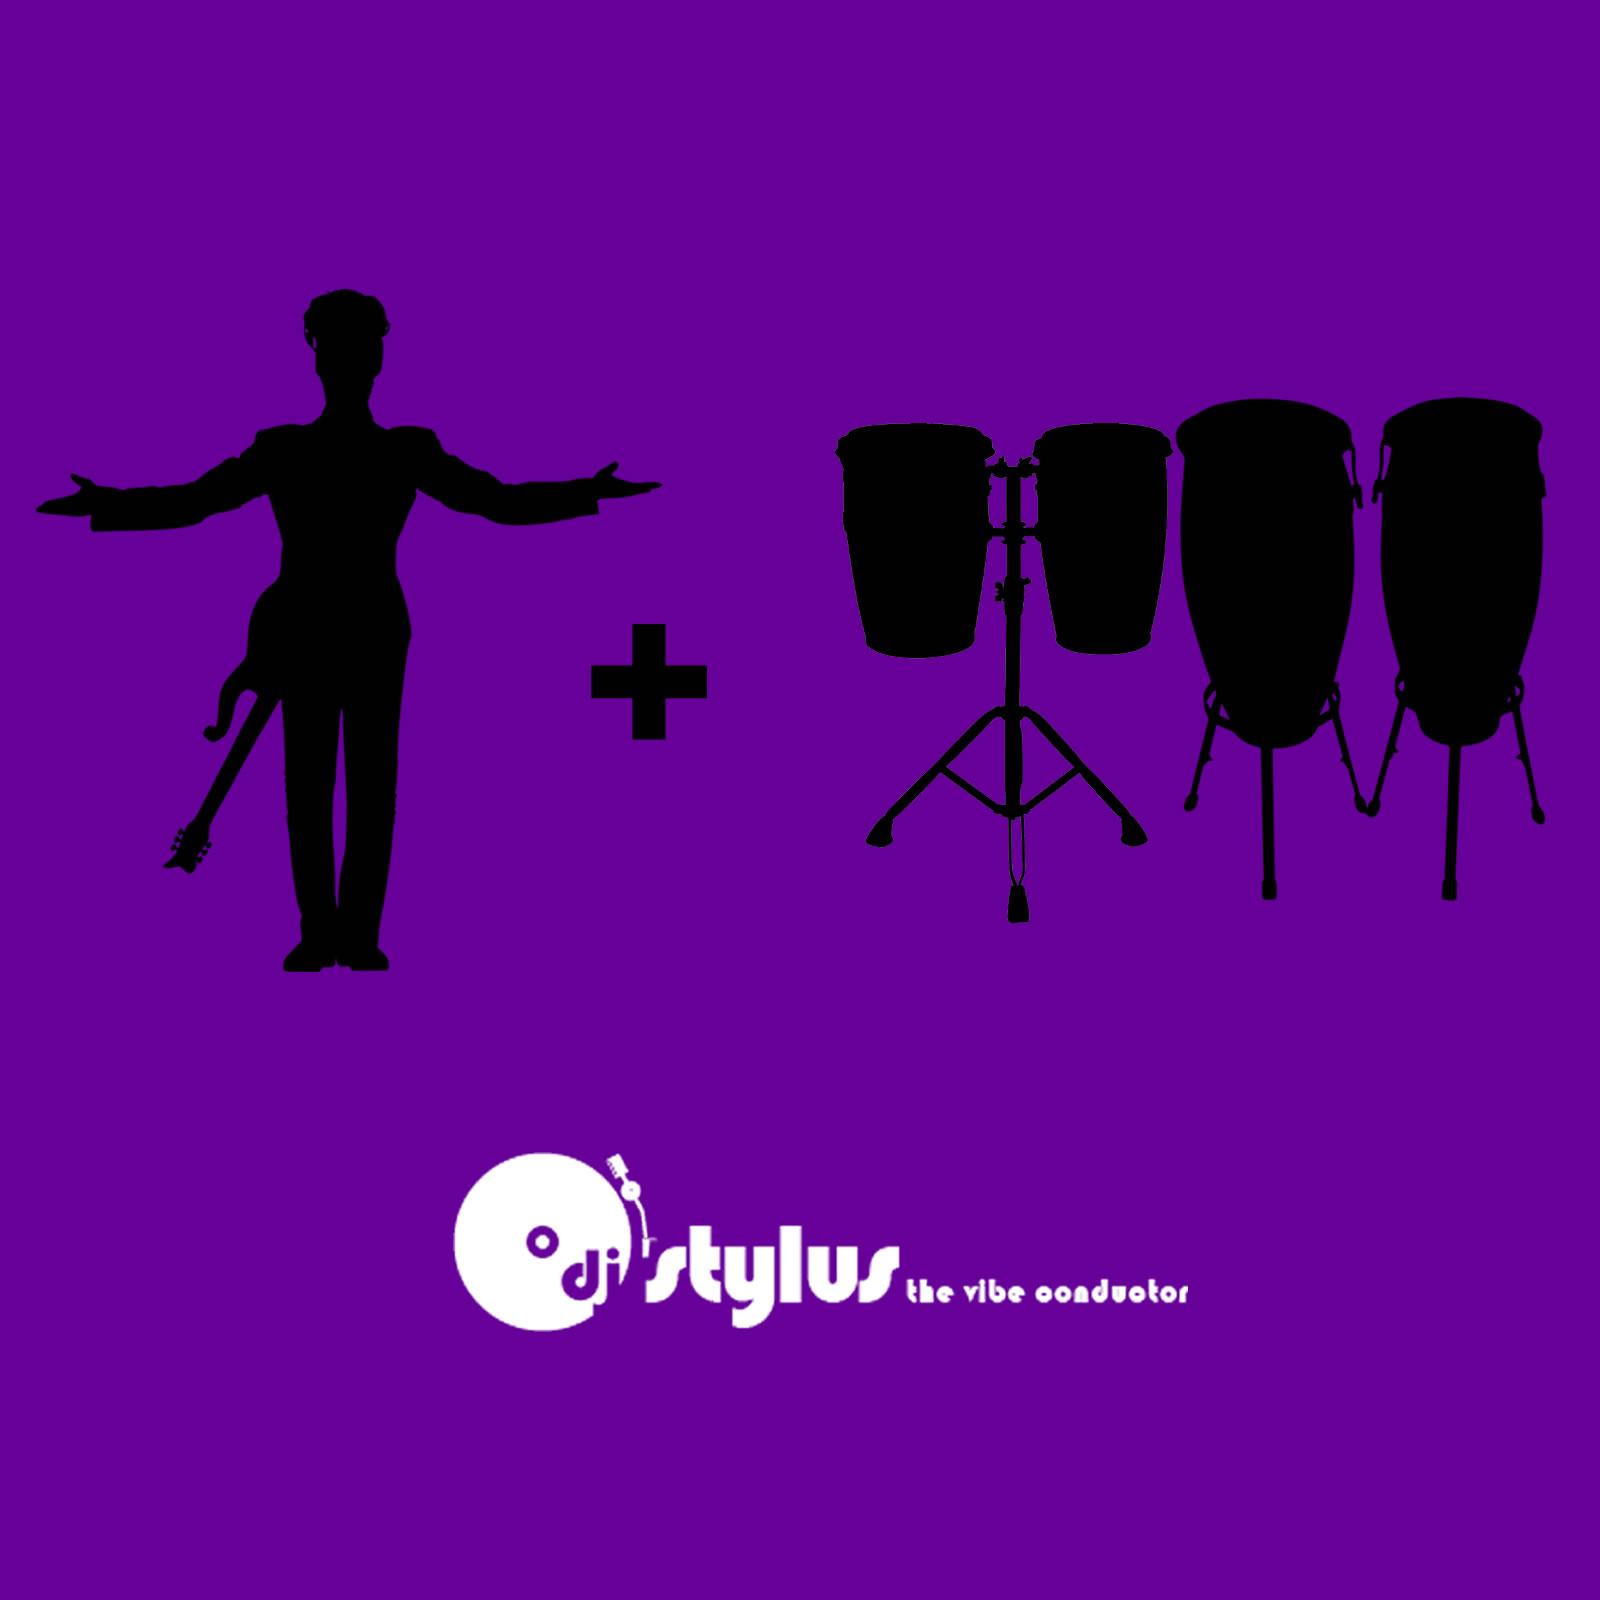 DJ Stylus - The Vibe Conductor - Purple Pockets